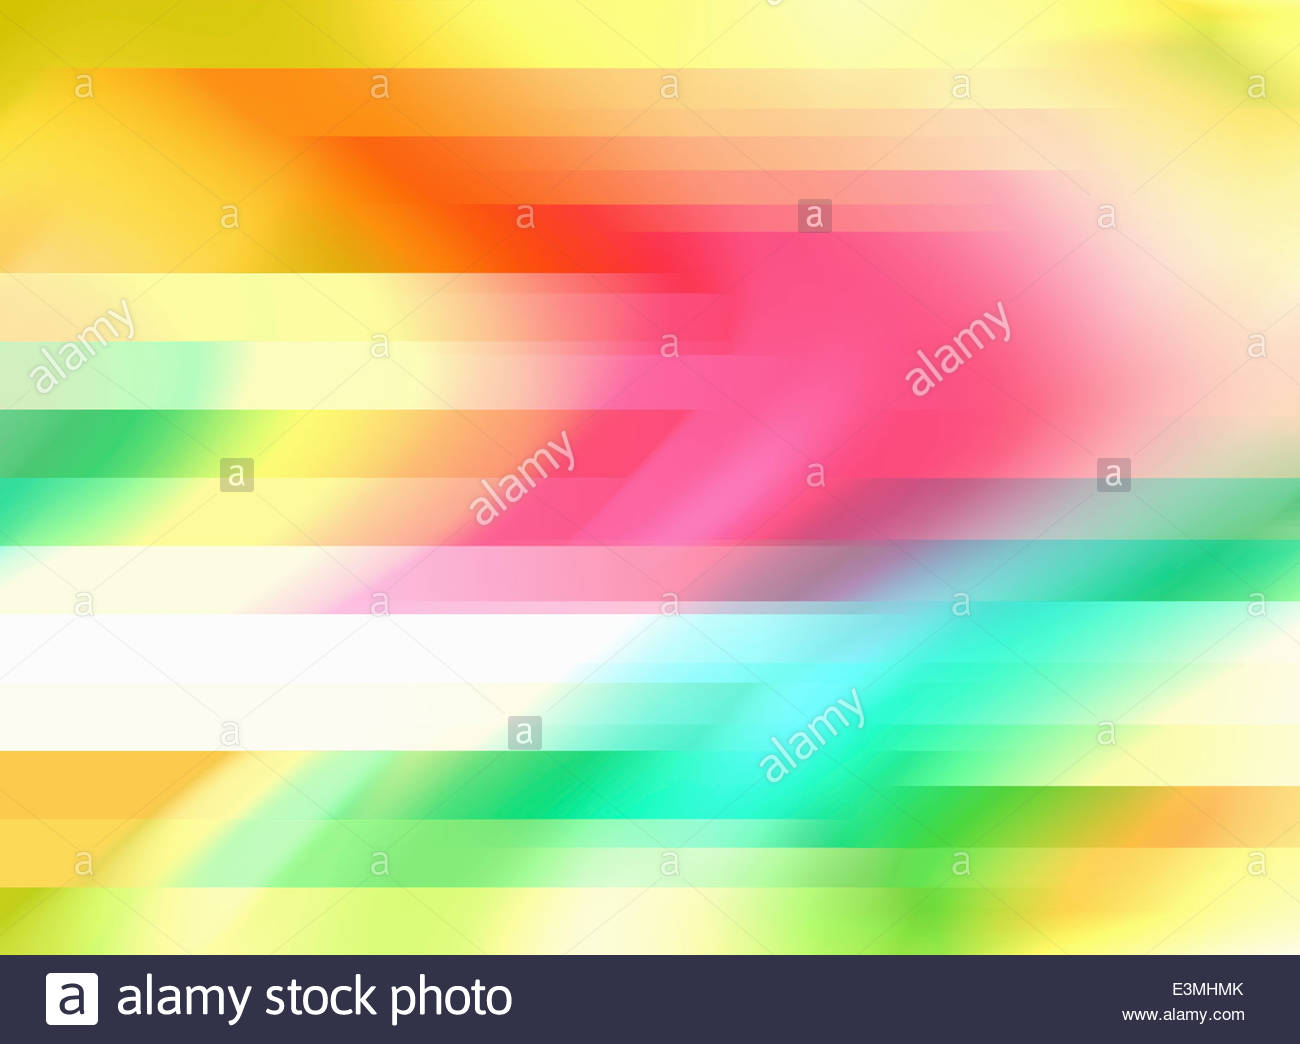 Mehrfarbige unscharfe abstrakte Hintergründe Muster Stockbild